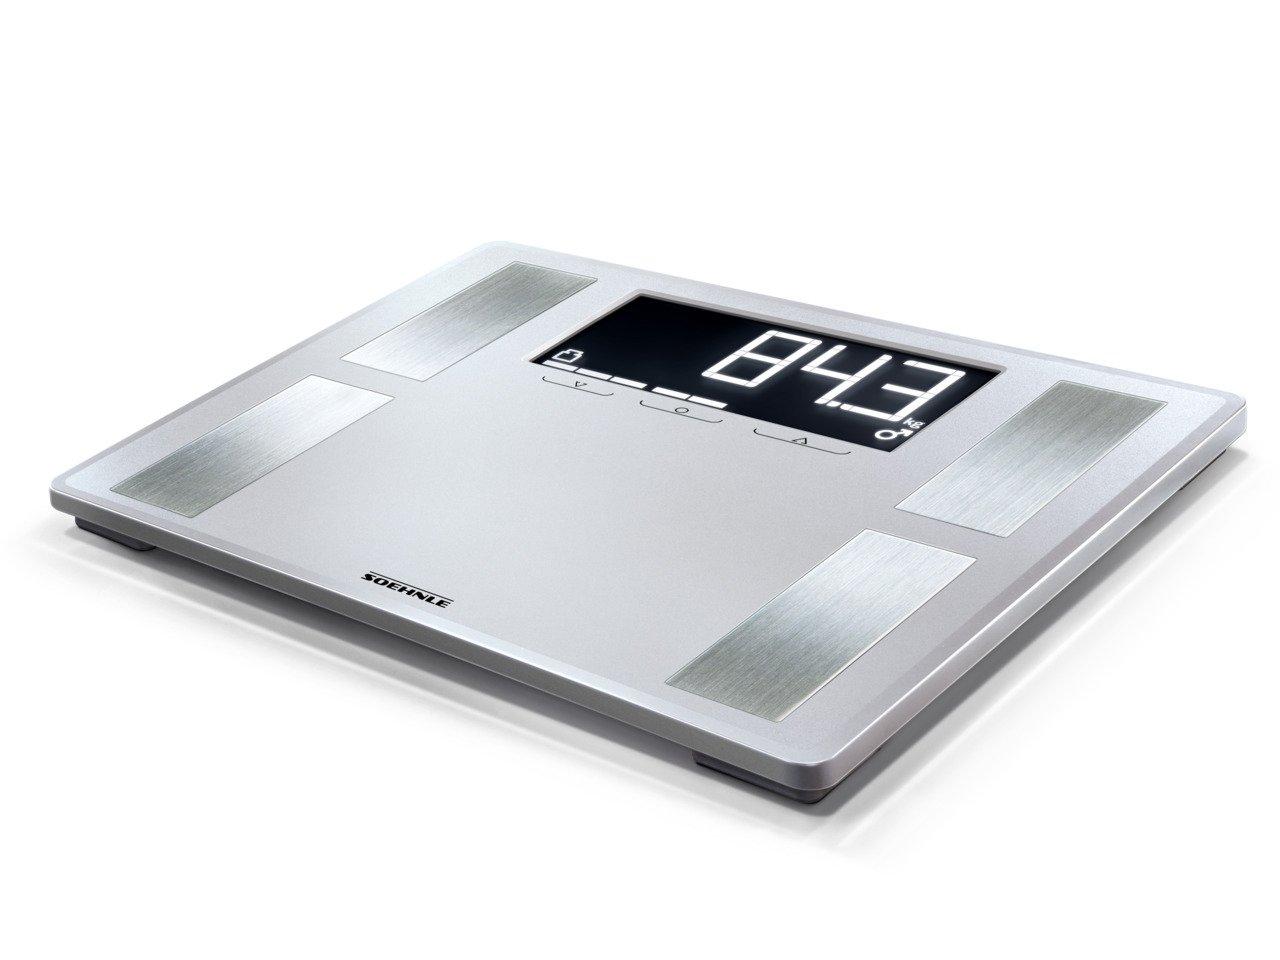 Soehnle 63870 Pesa Persona Elettronica di Analisi Corporea Shape Sense Profi 200 180 kg Leifheit